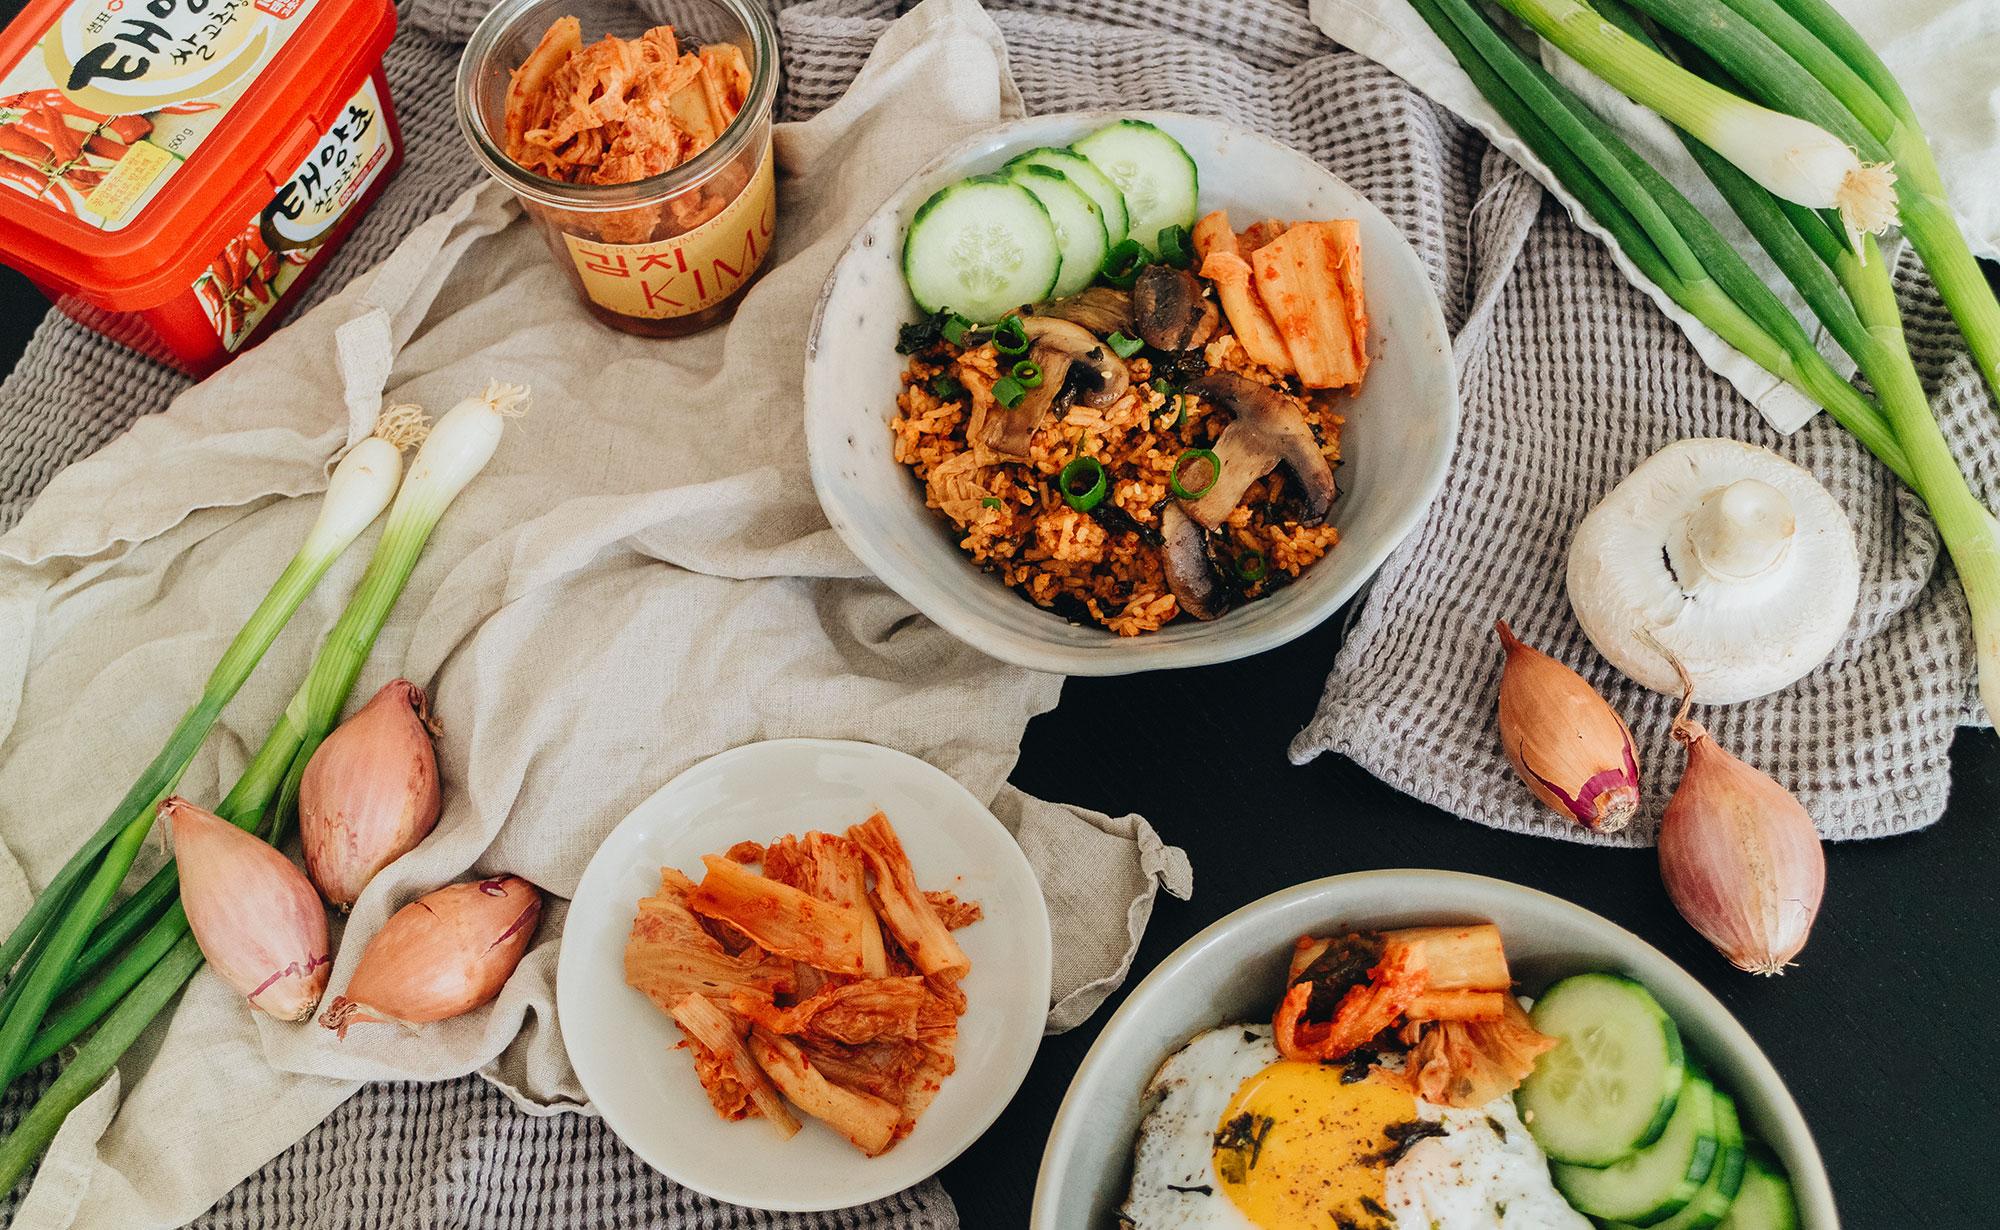 Rezept: Kimchi Fried Rice Recipe – 볶음밥 Kimchi Bokkeumbap / Einfaches Reis Rezept zum selbermachen – Travel, Food, Lifestyle & Fashionblog by Alice M. Huynh